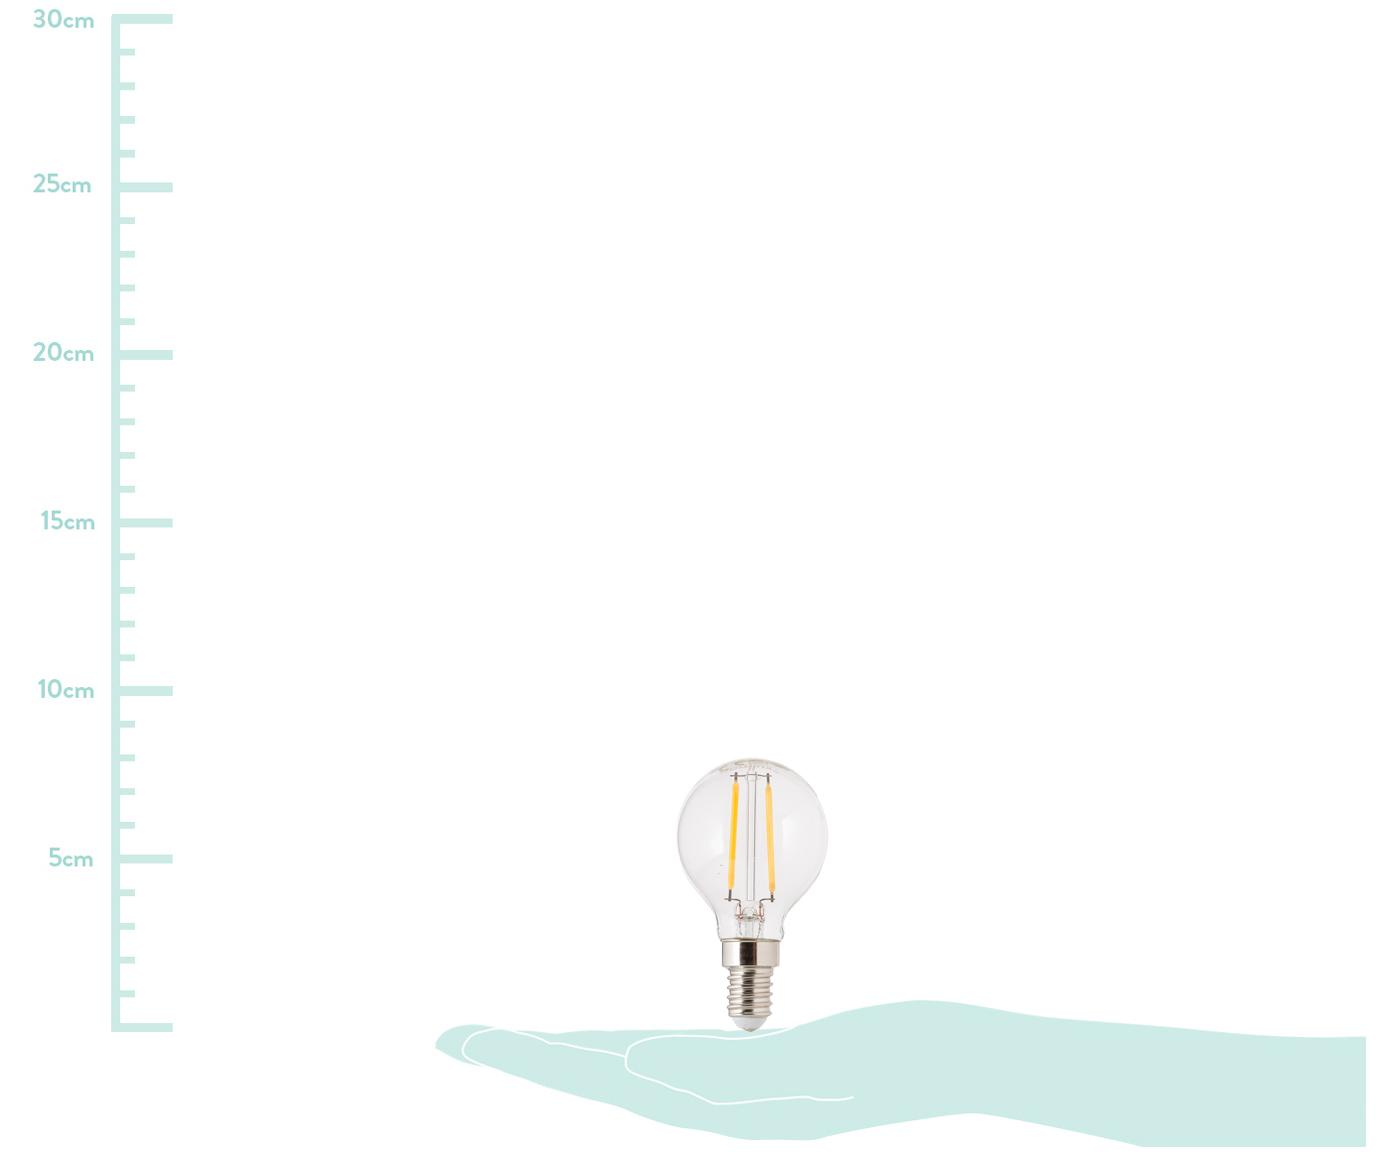 LED Leuchtmittel Yekon (E14/2.5W), 5 Stück, Leuchtmittelschirm: Glas, Leuchtmittelfassung: Aluminium, Transparent, Ø 5 x H 8 cm